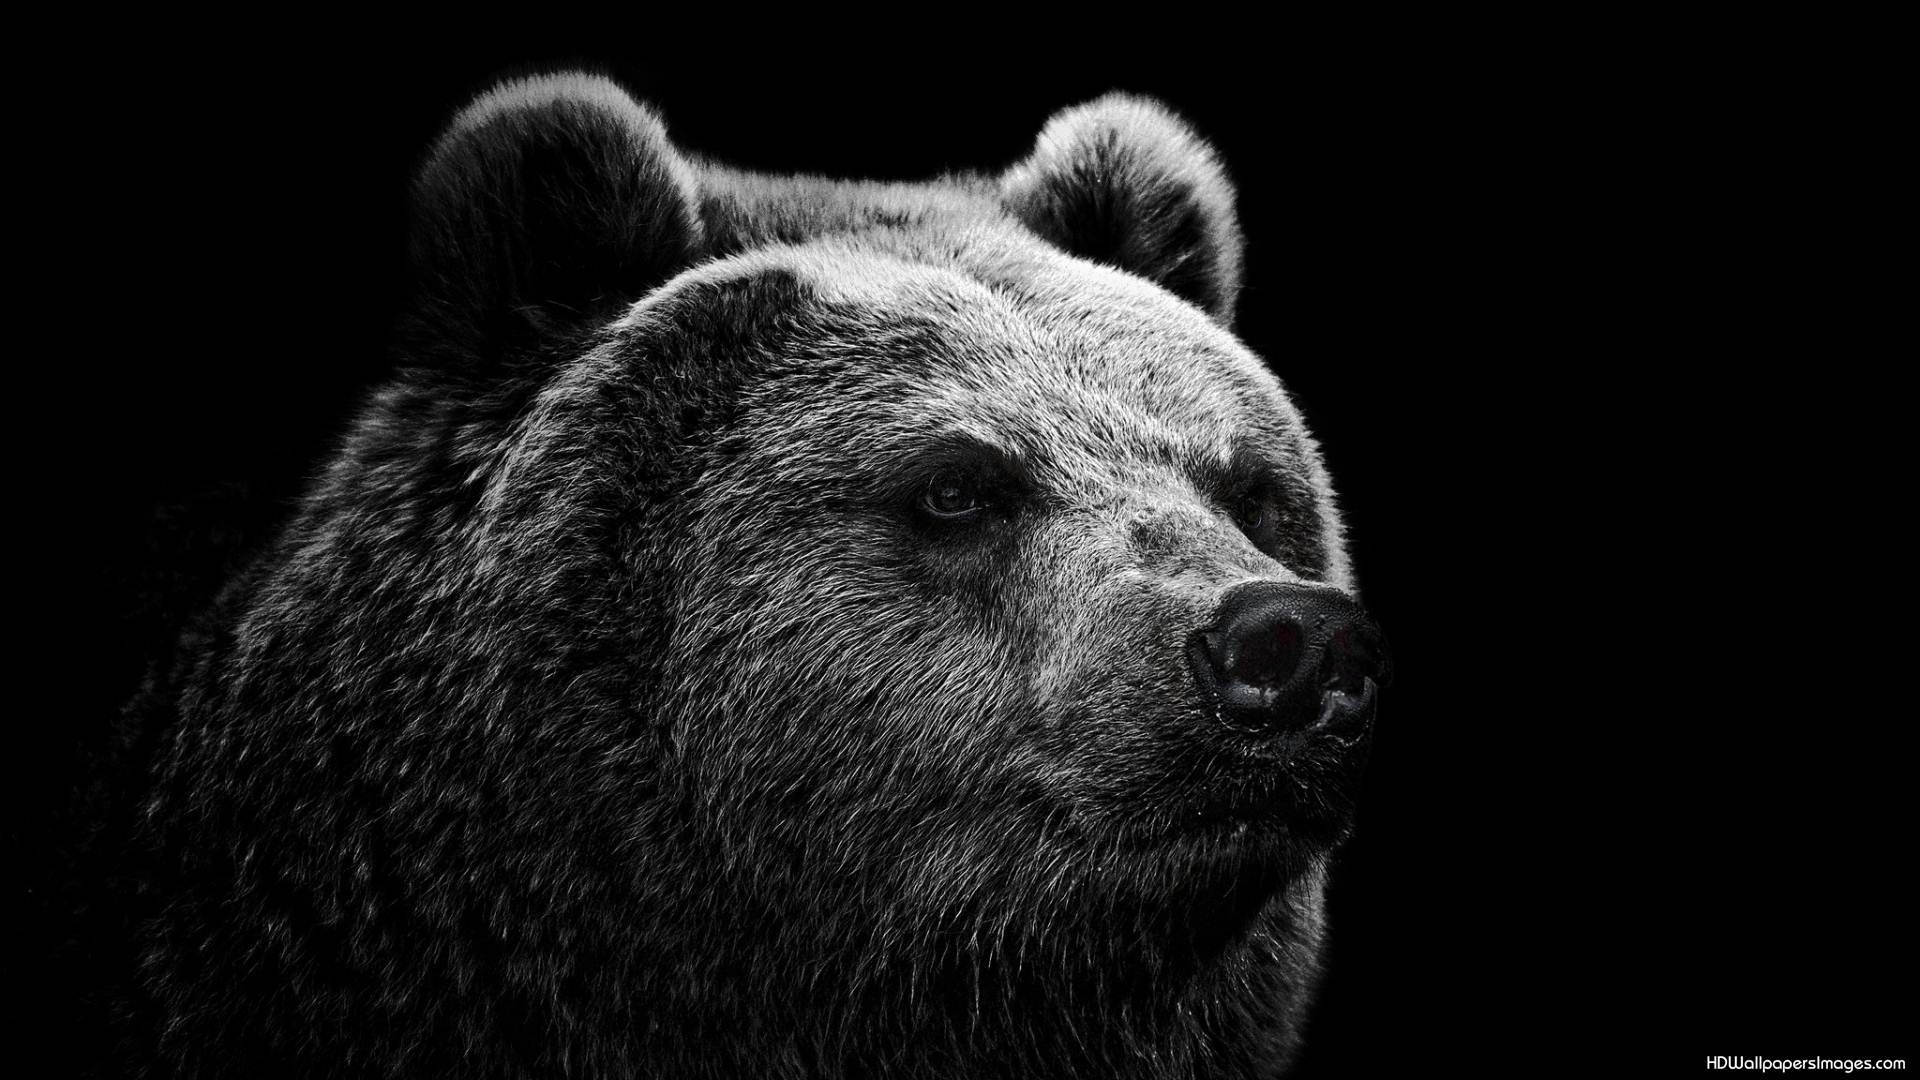 Bear Wallpaper High Resolution Coca Cola Fantasy 1920x1080 Bears